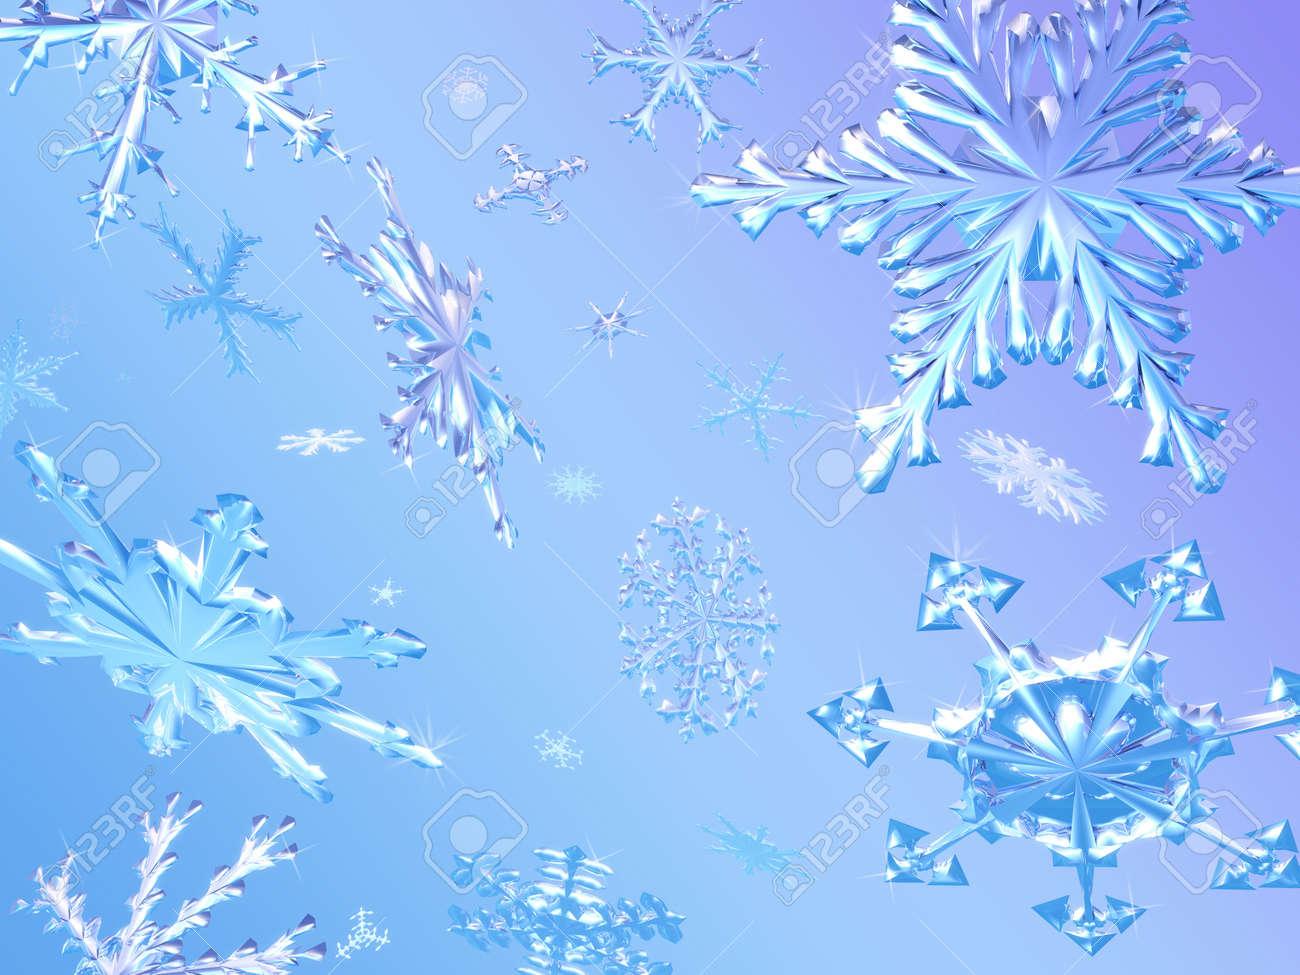 Snowflakes Falling - 3D render Stock Photo - 11277200